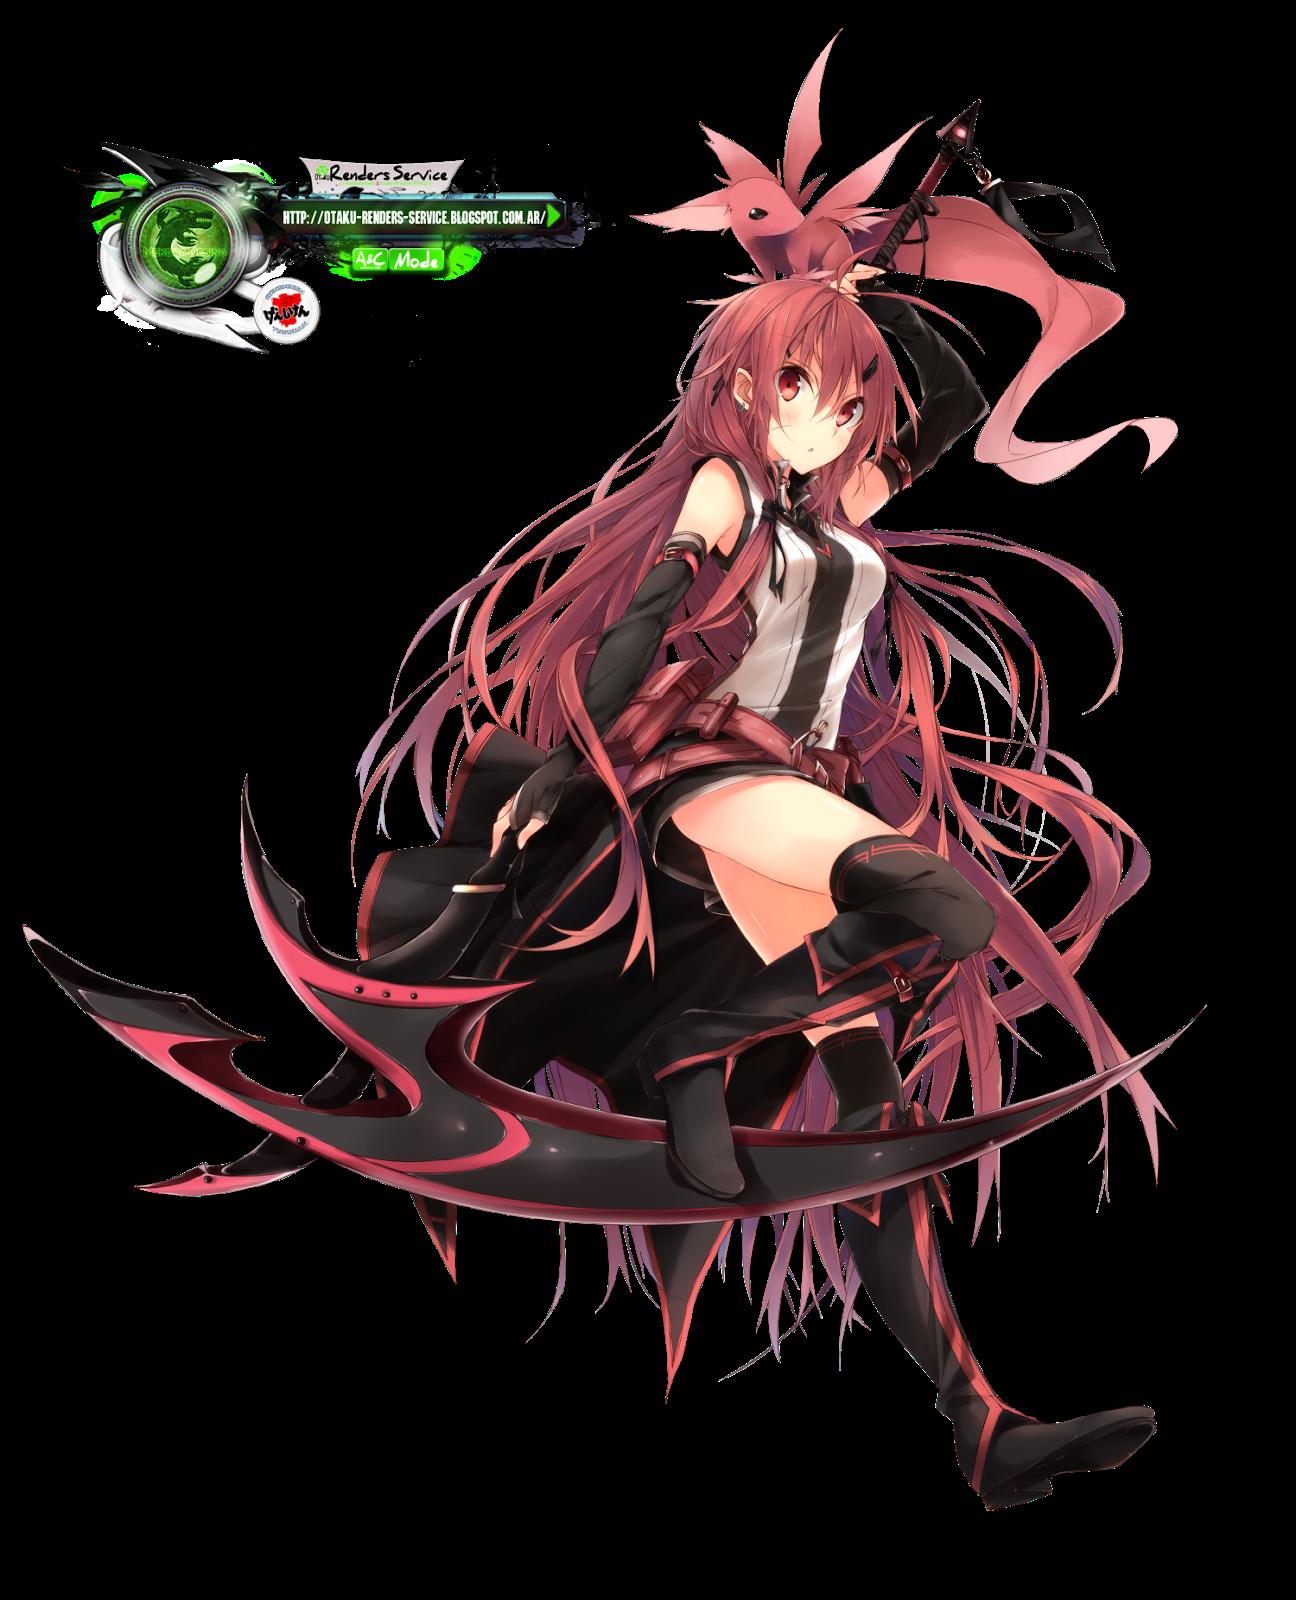 Fantasy Warrior Girl Kakoii Render Png 1296 1600 Guerreiro Anime Menina Anime Anime